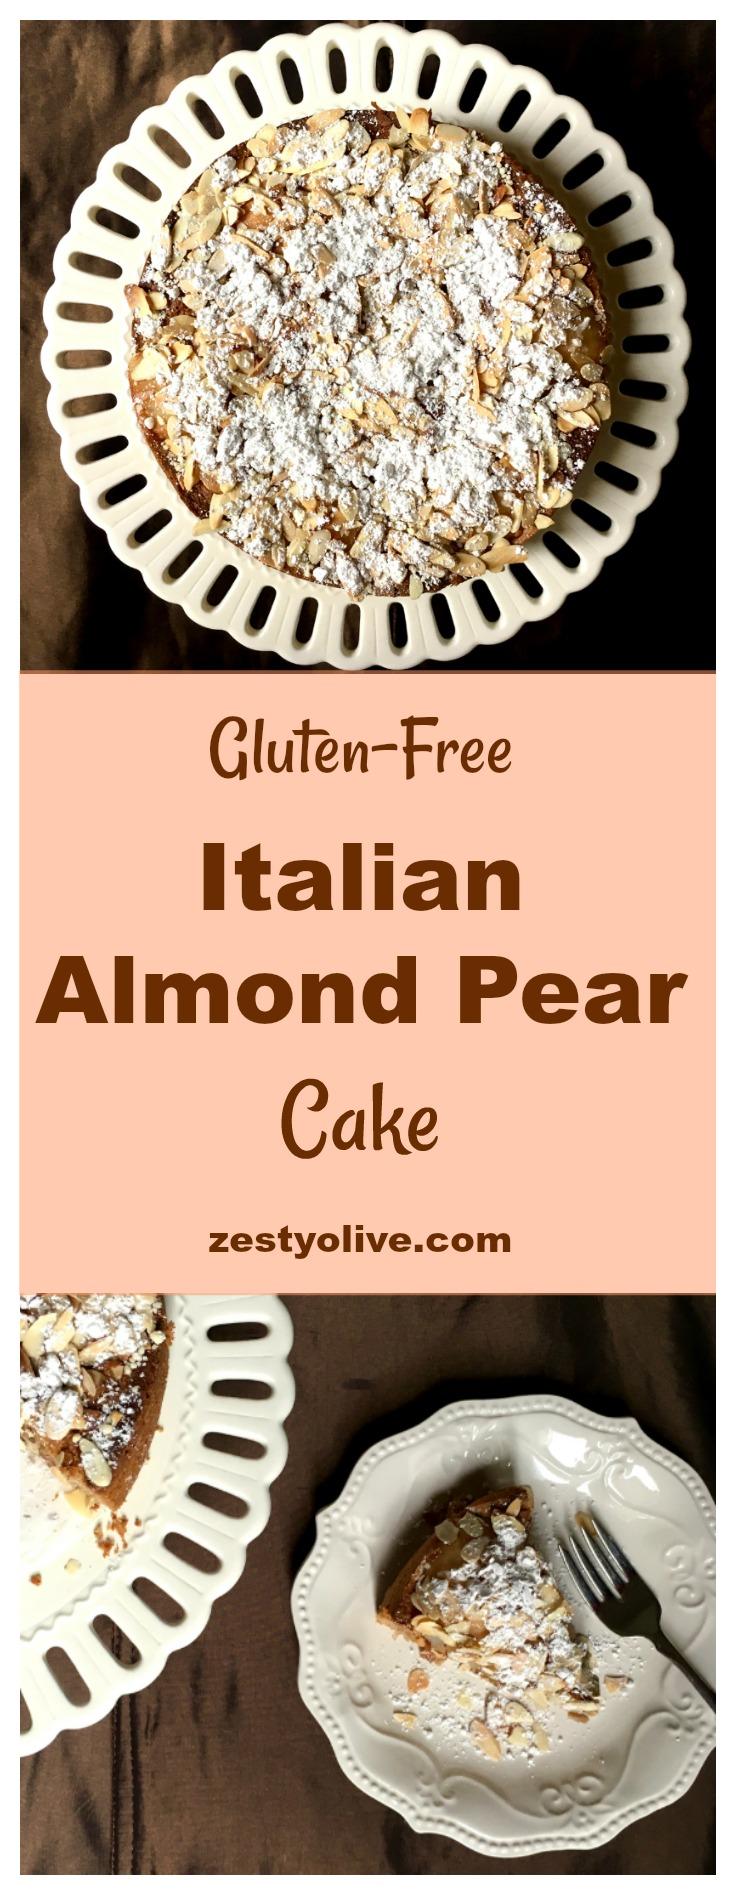 Gluten-Free Italian Pear Almond Cake